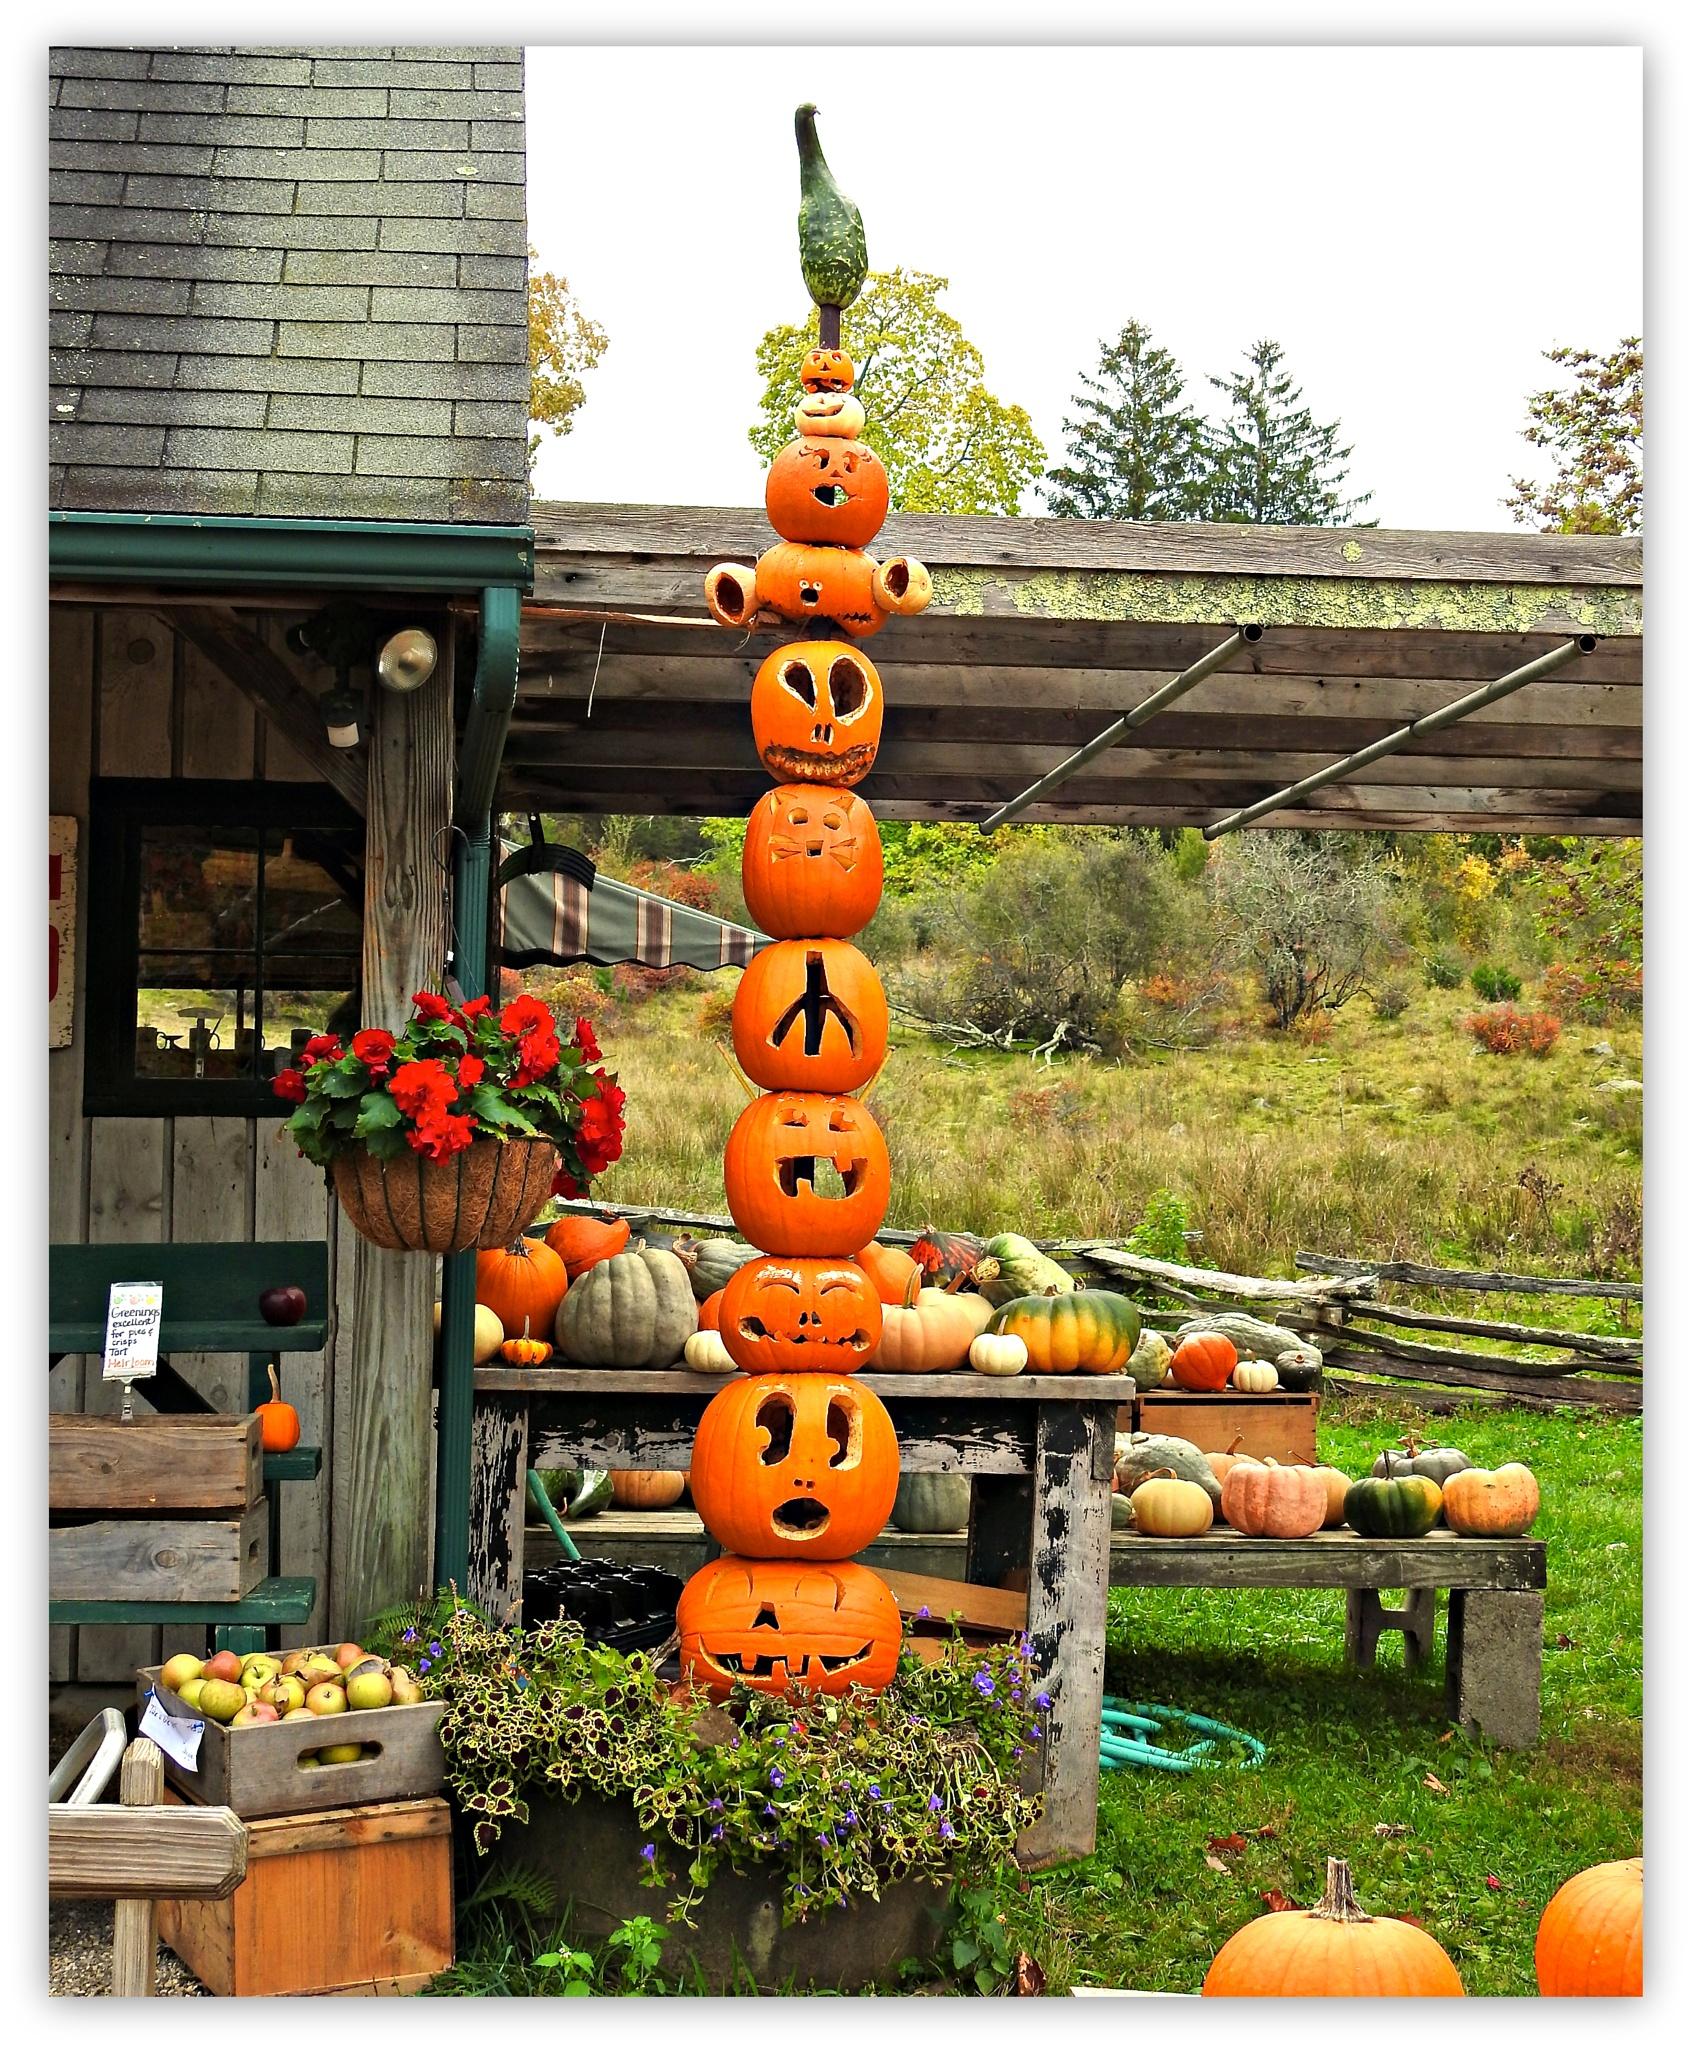 Pumpkin Totem by Dana Wiehl